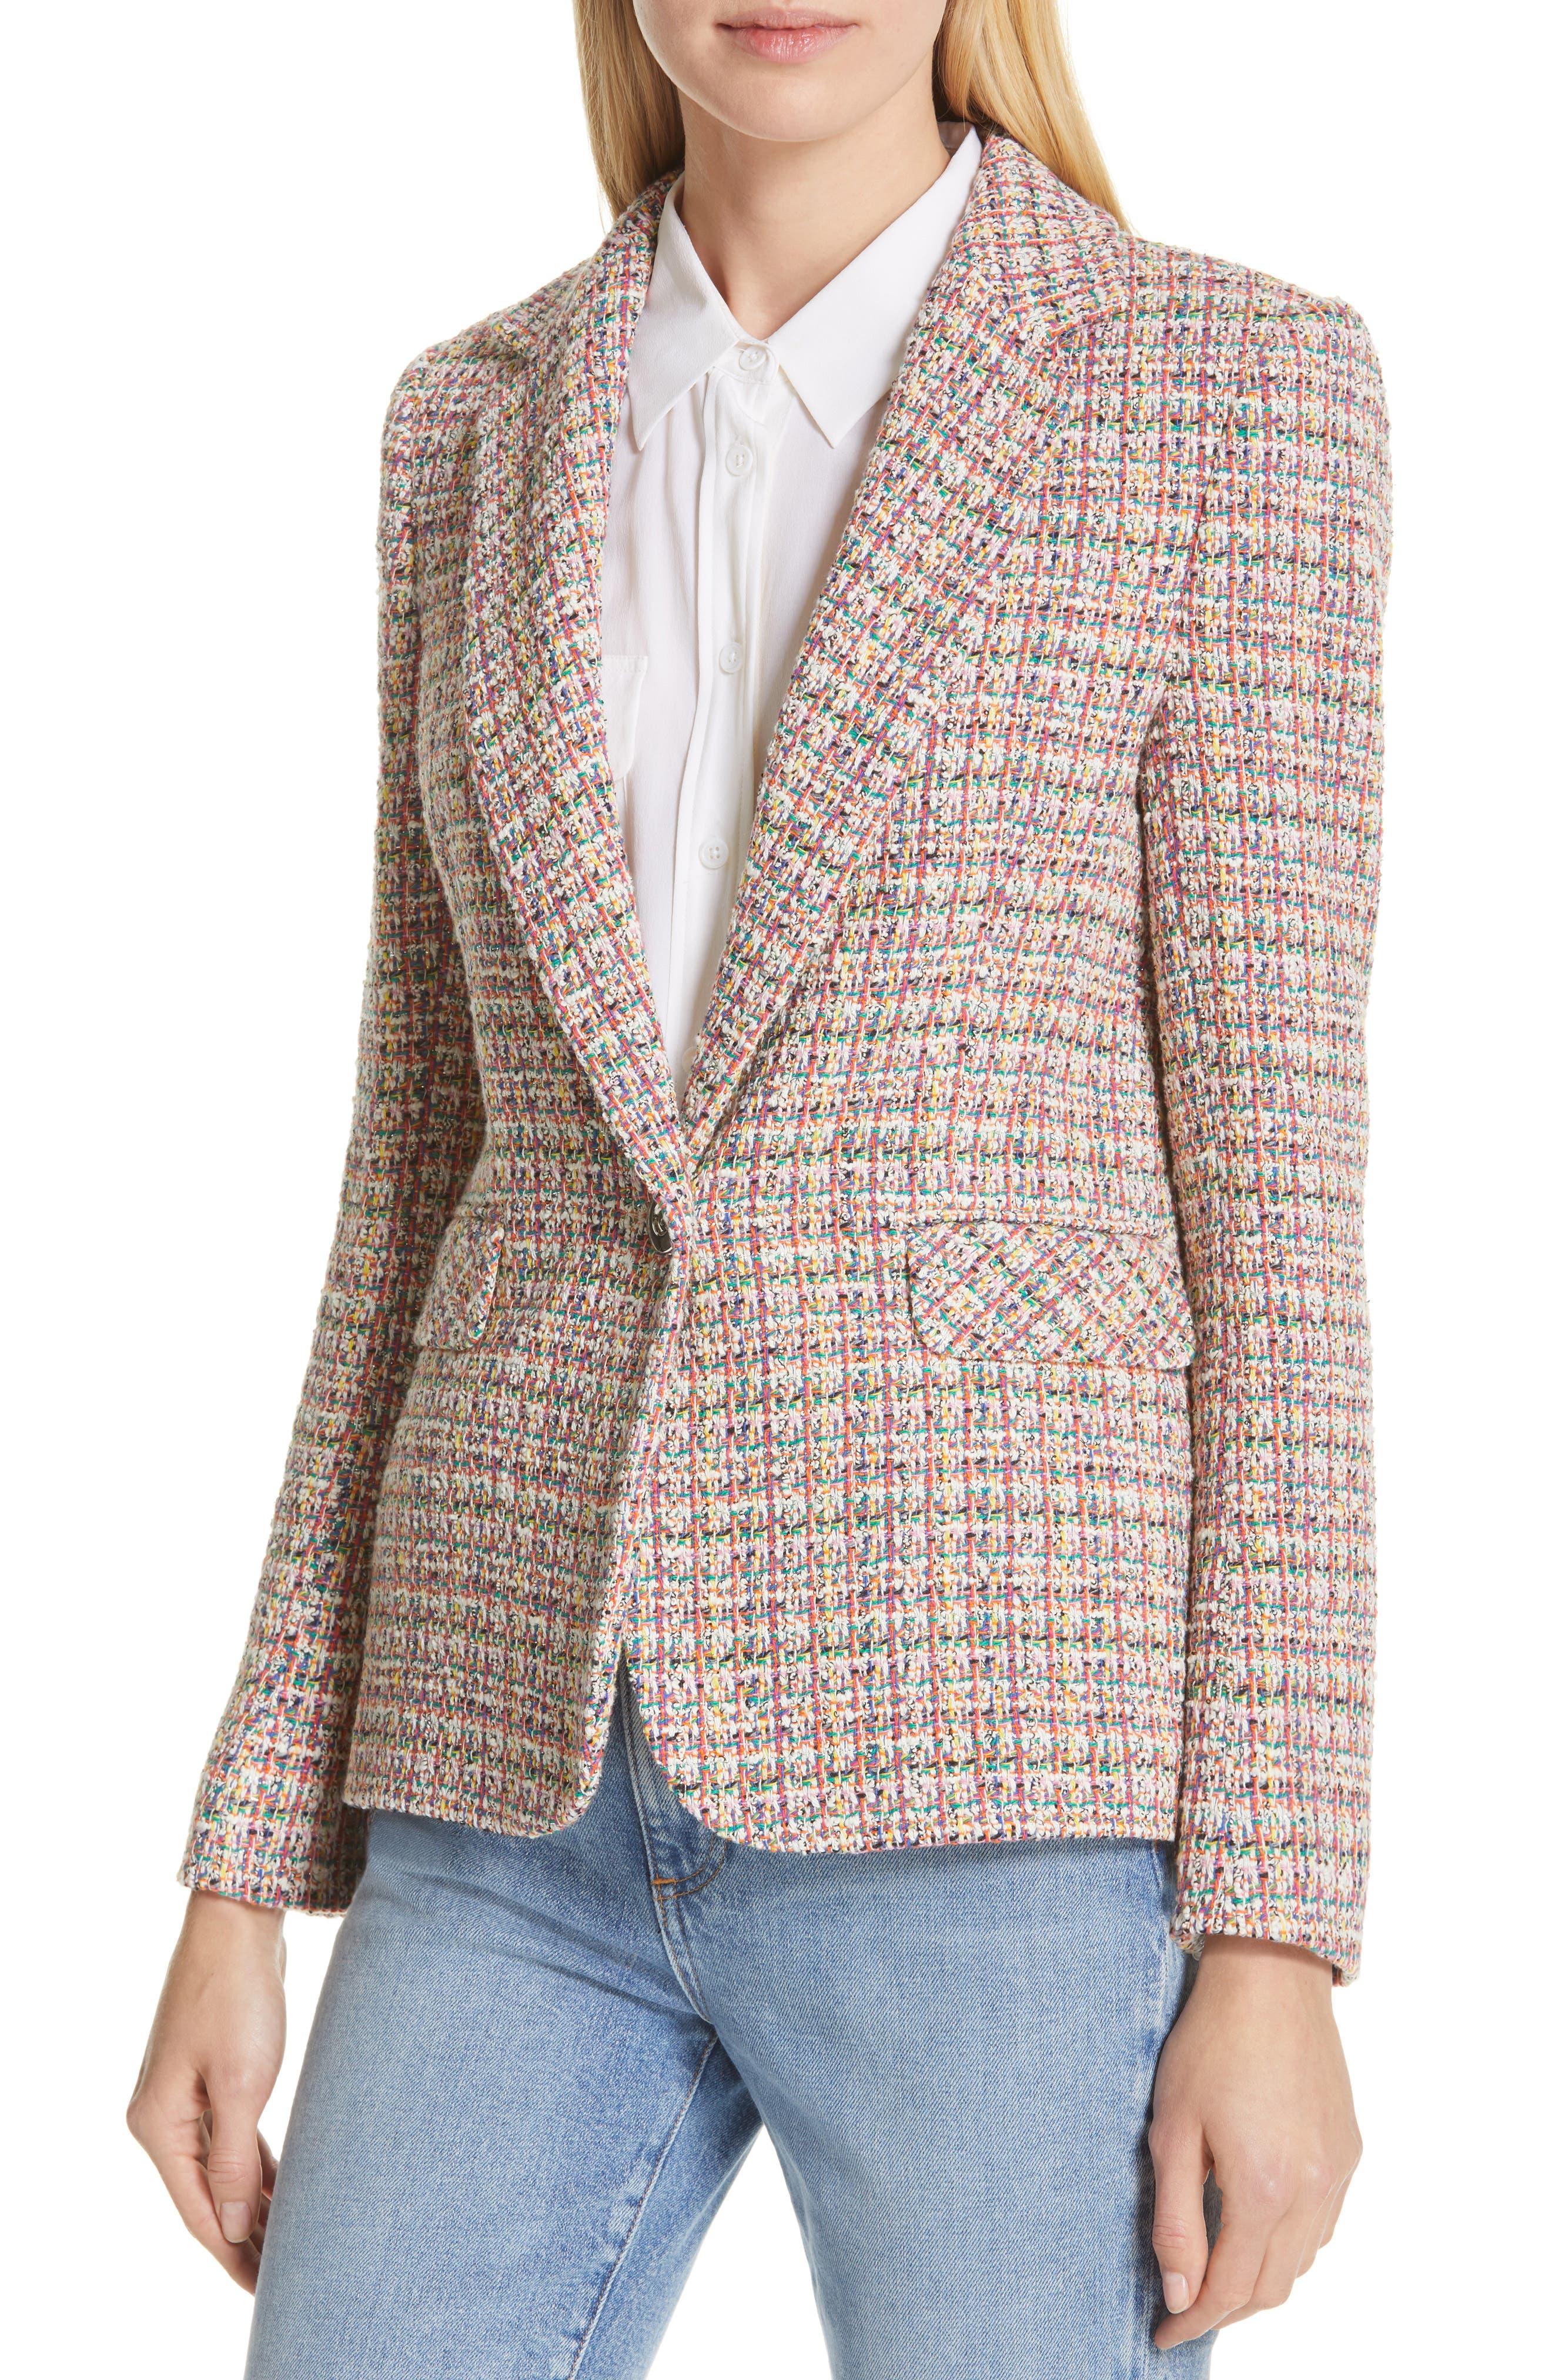 HELENE BERMAN, Colorful Tweed Blazer, Alternate thumbnail 4, color, ORANGE